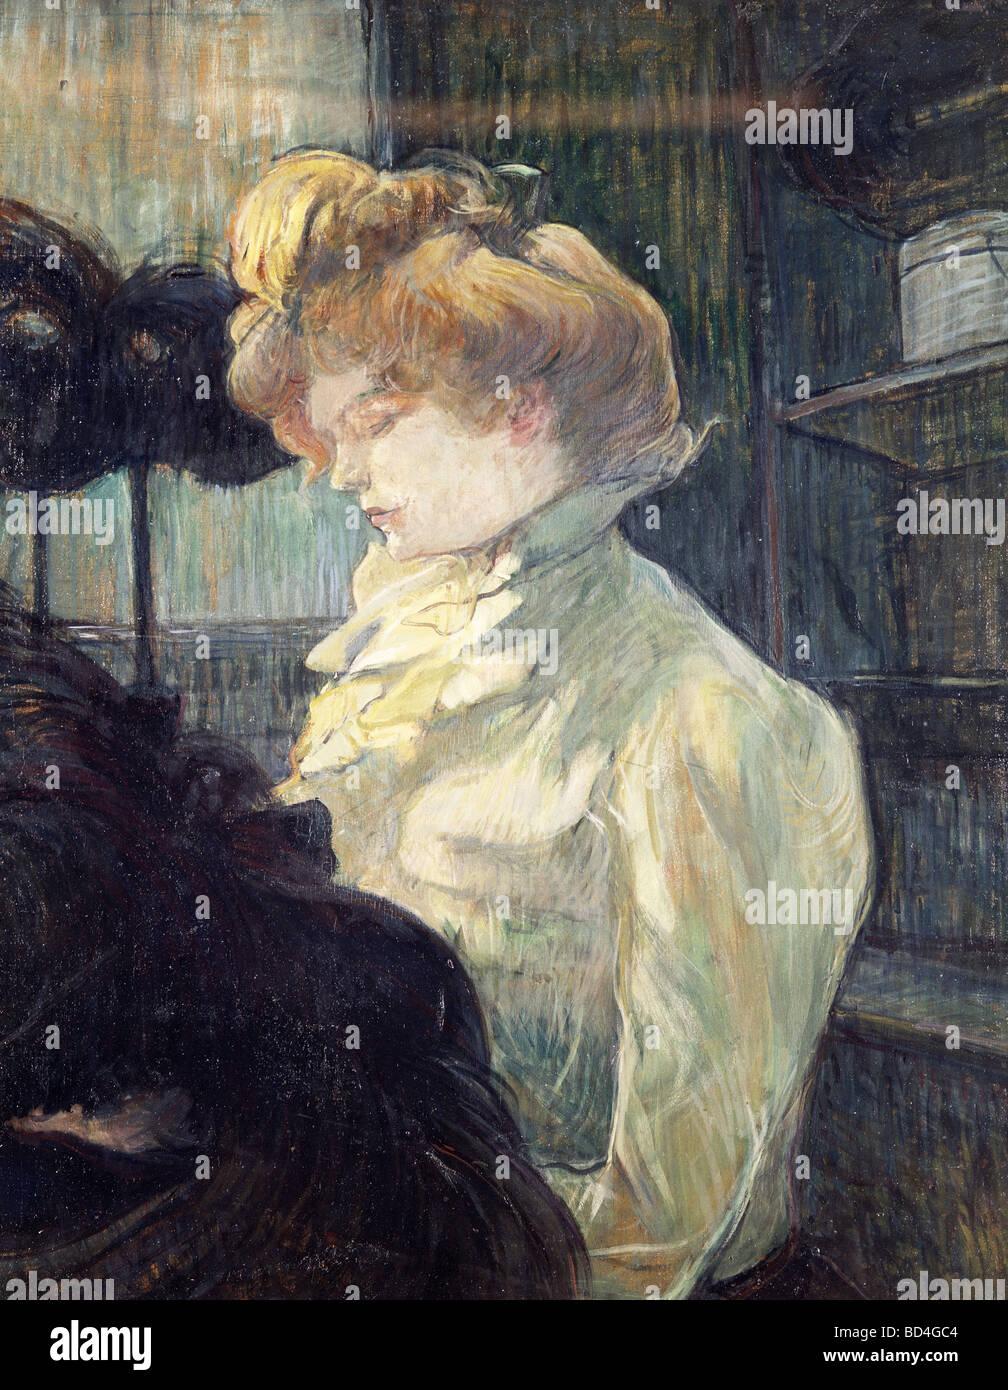 Bellas artes, Henri de Toulouse-Lautrec, (1864 - 1901), pintura, 'La Modiste', 1900, Museo de Albi, Europa, Francia, Foto de stock